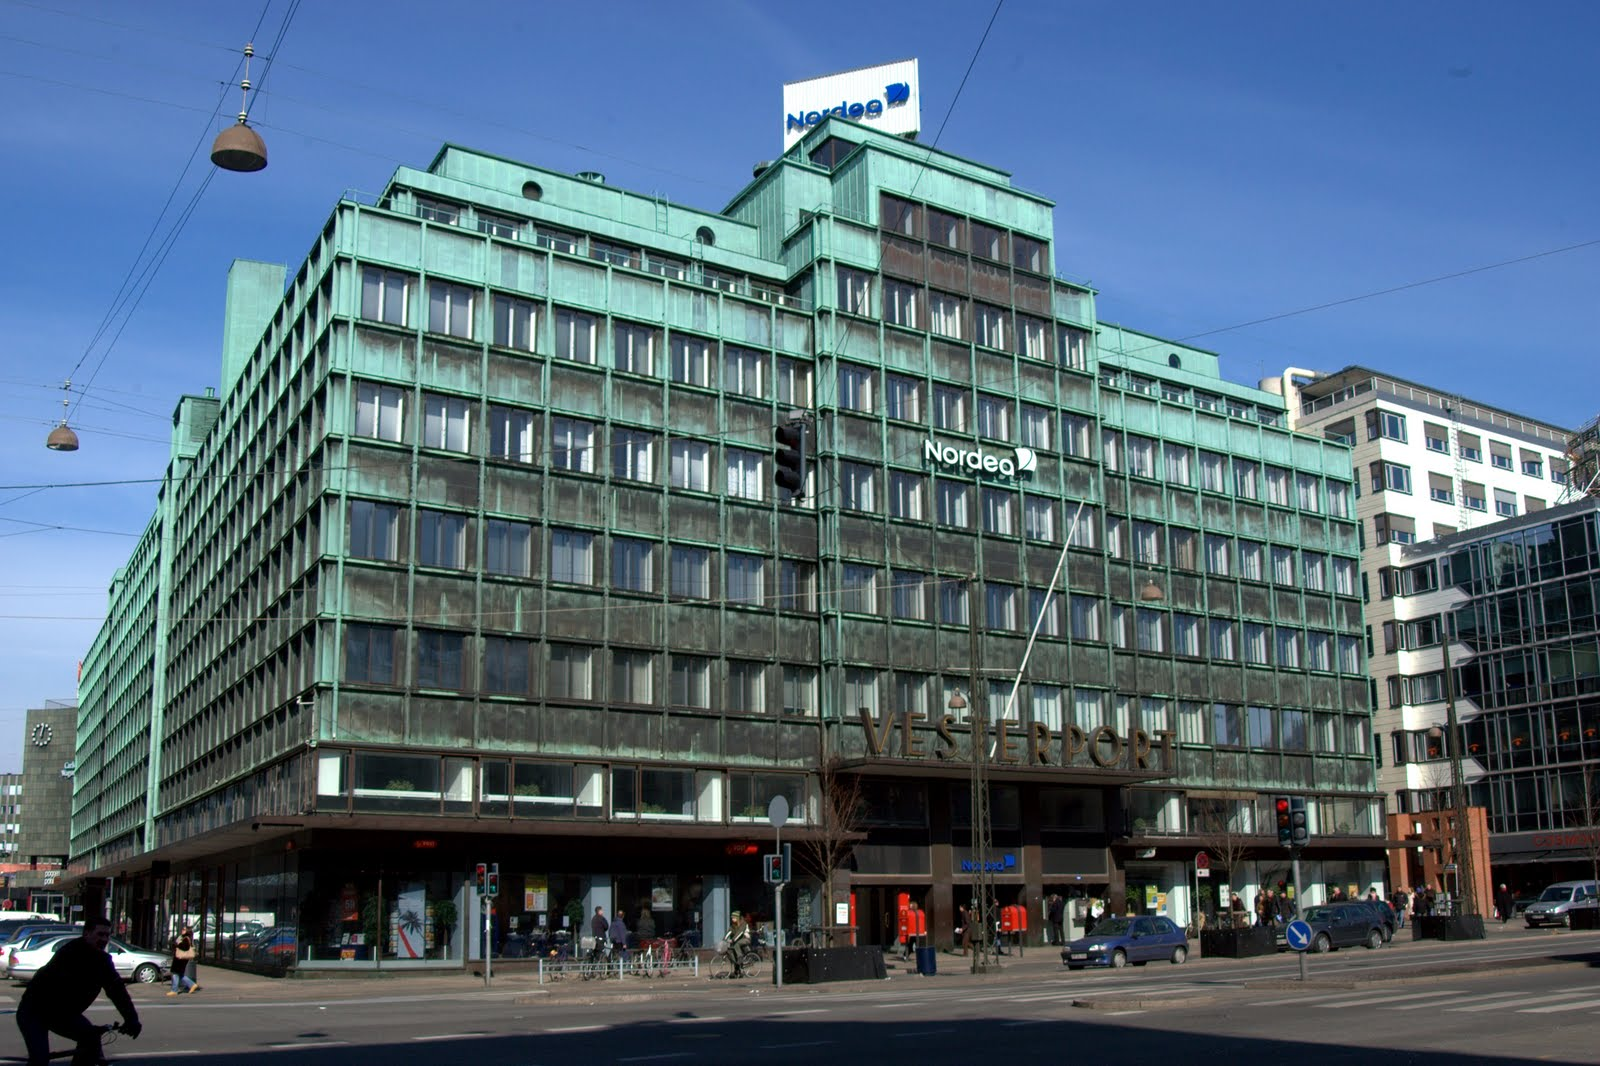 nordea bank sweden